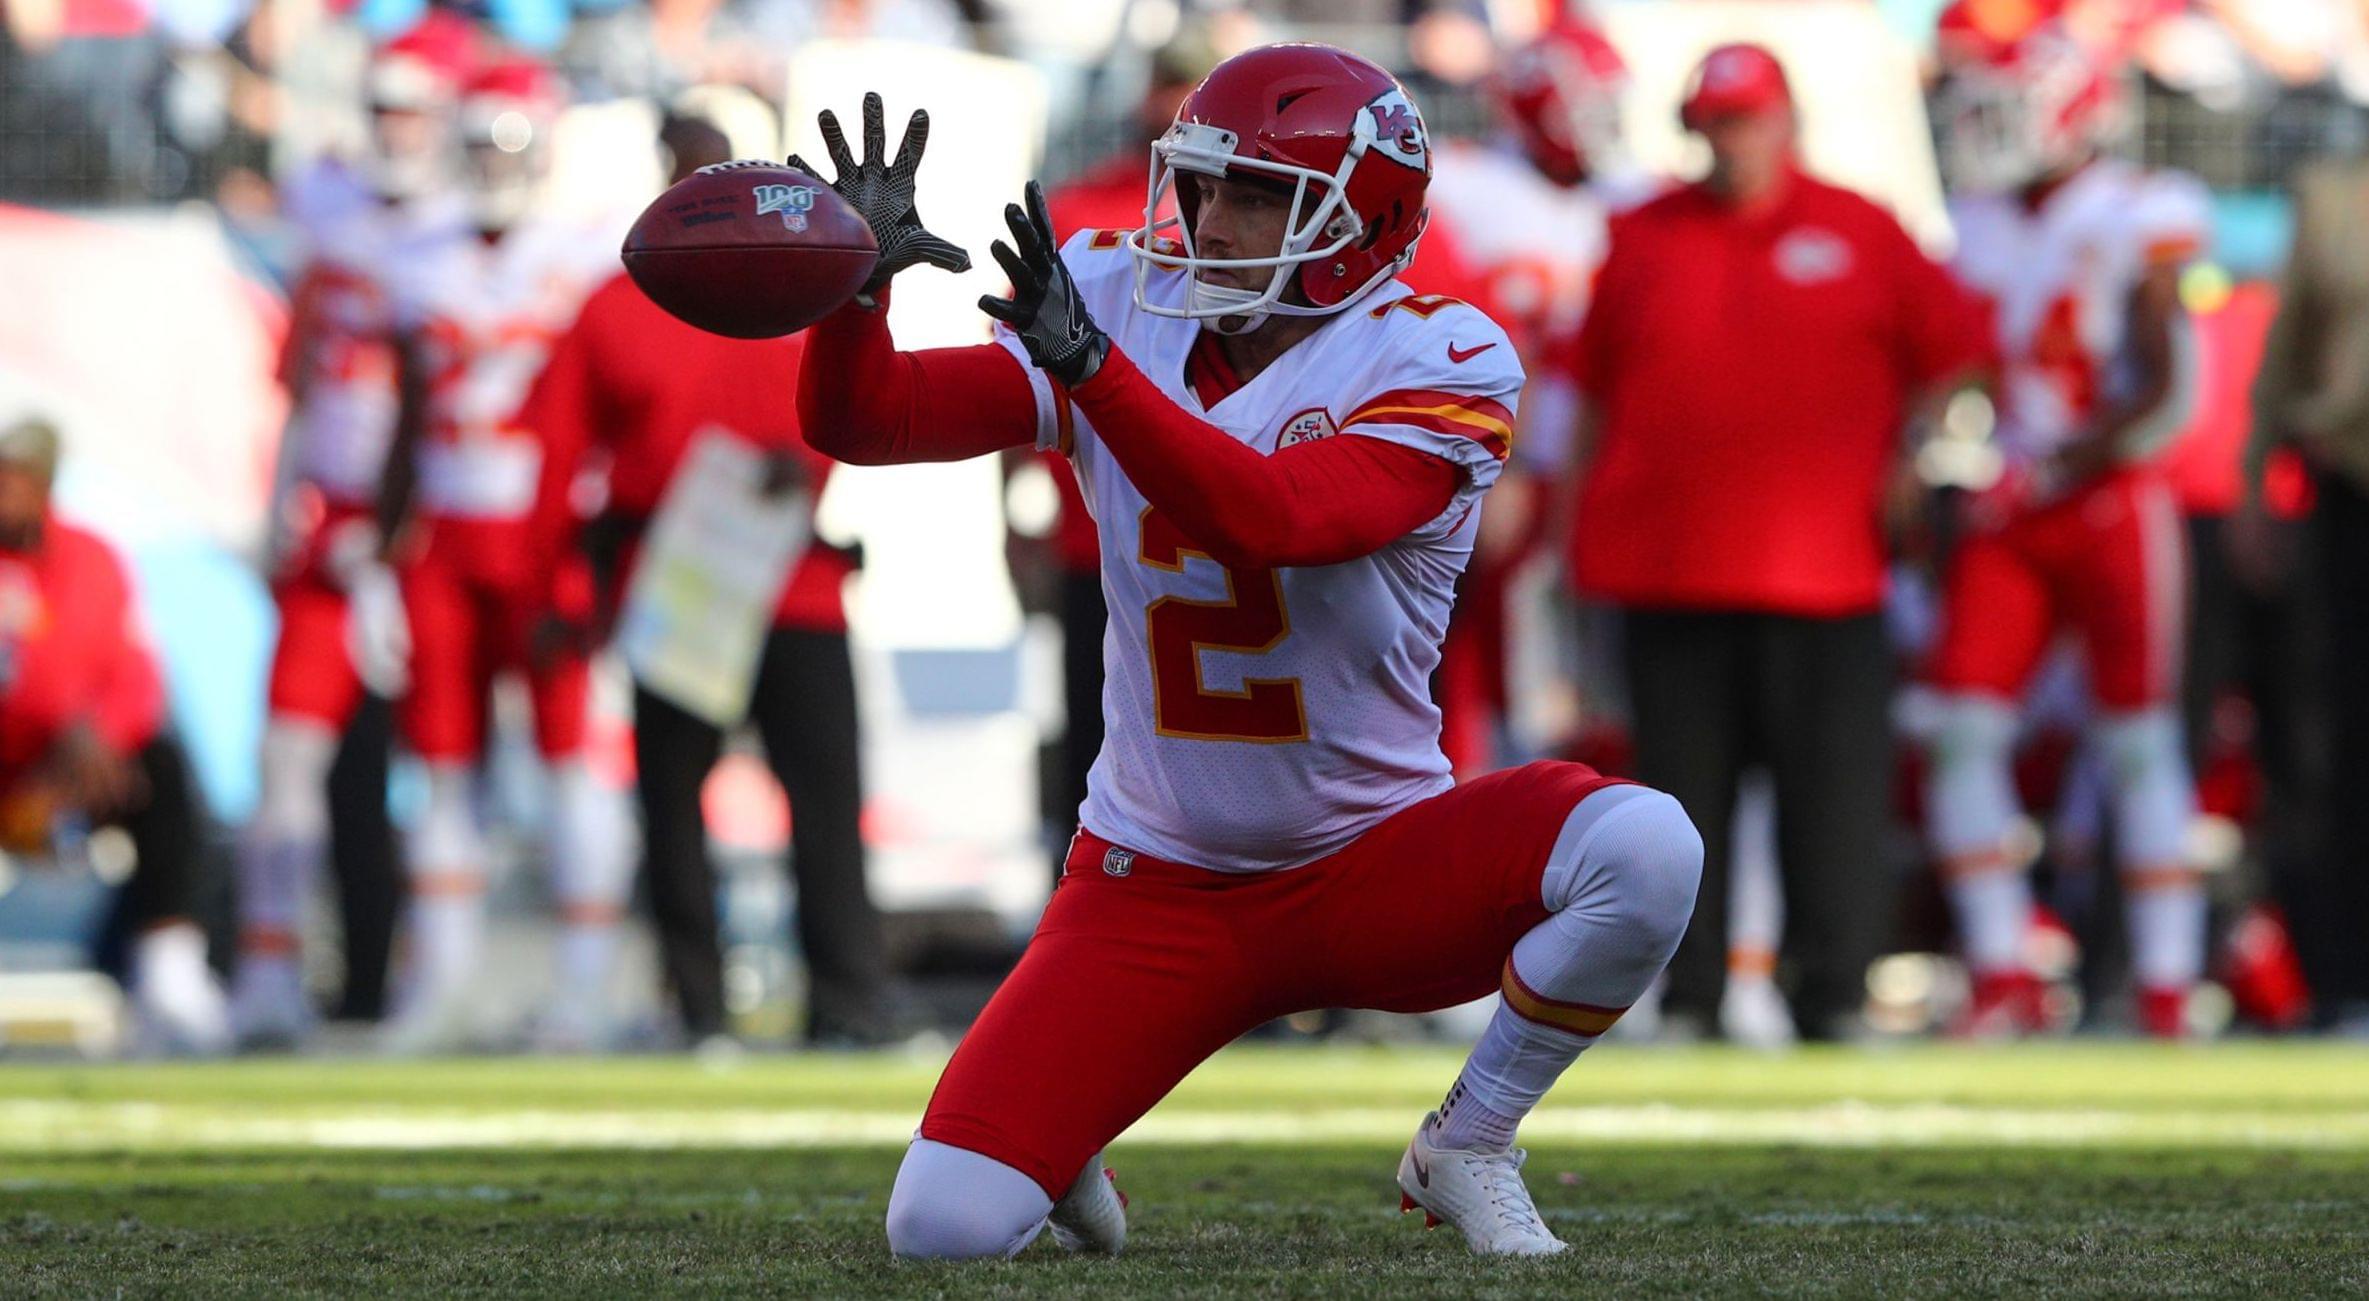 Chiefs' Special Teams Seeking Redemption